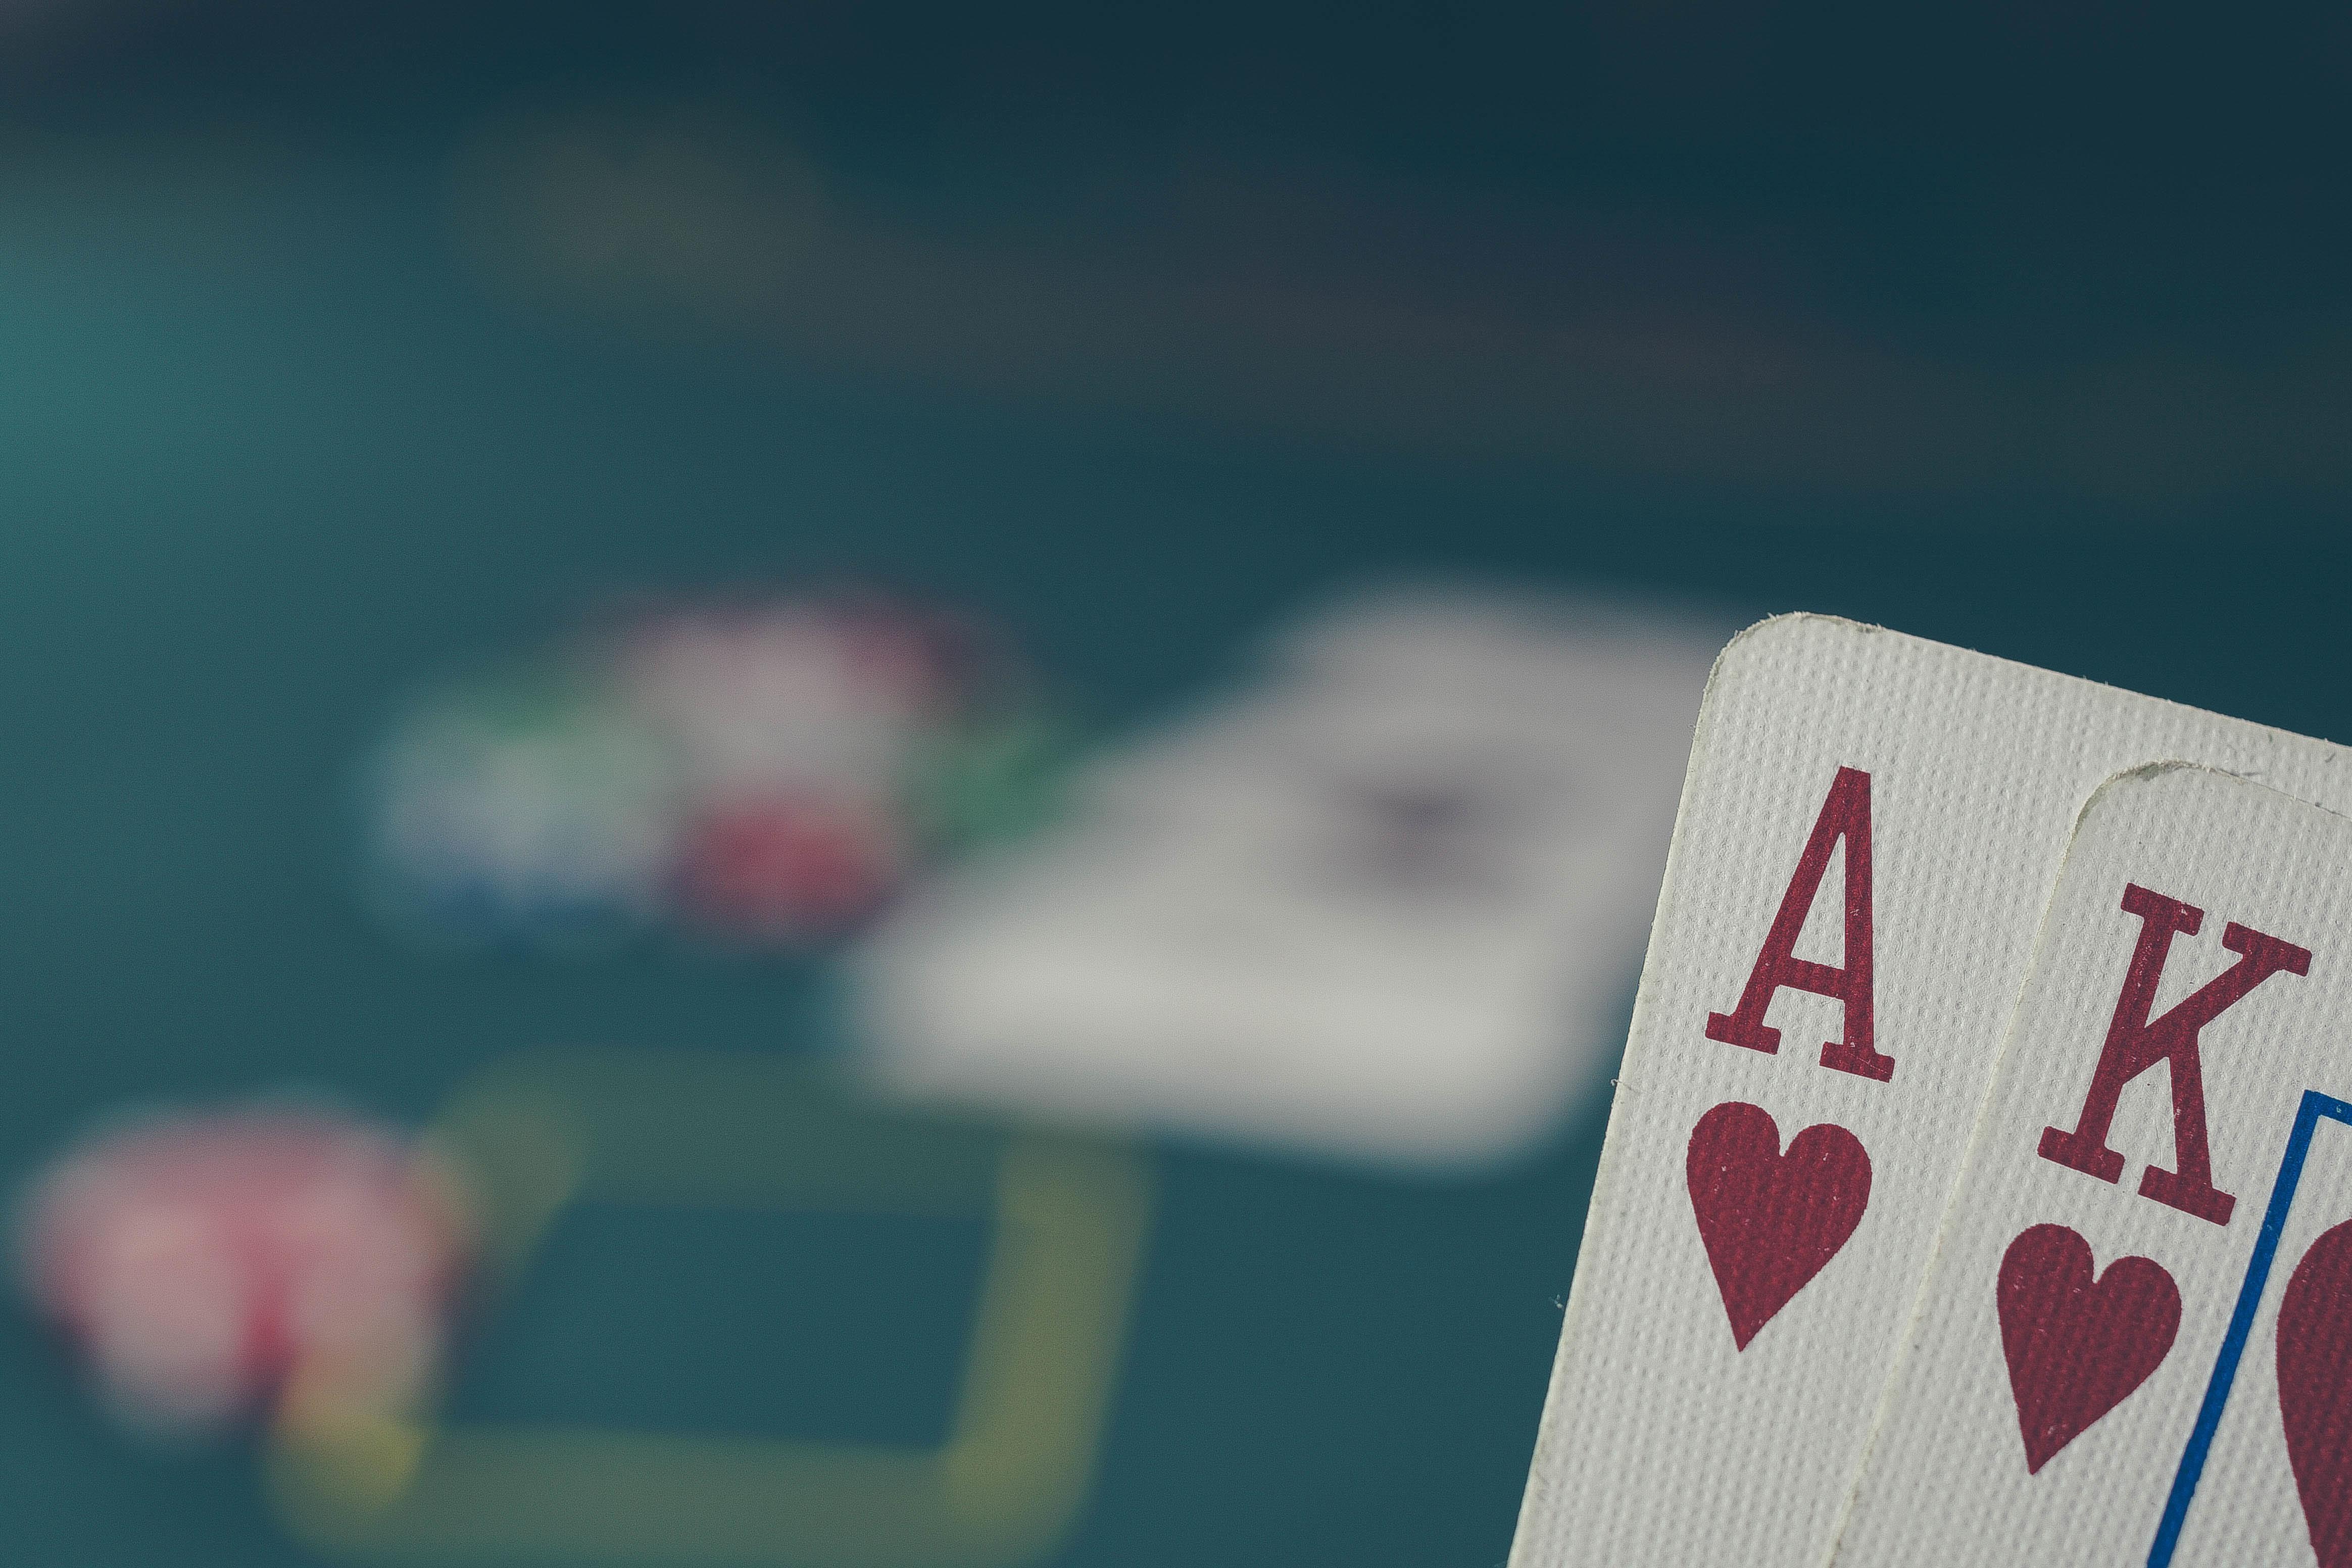 Gambar Pertandingan Teks Perjudian Permainan Kartu Fon Langit Rekreasi Poker Merah Tua Awan Jumlah Simbol Cinta 4656x3104 1612183 Galeri Foto Pxhere